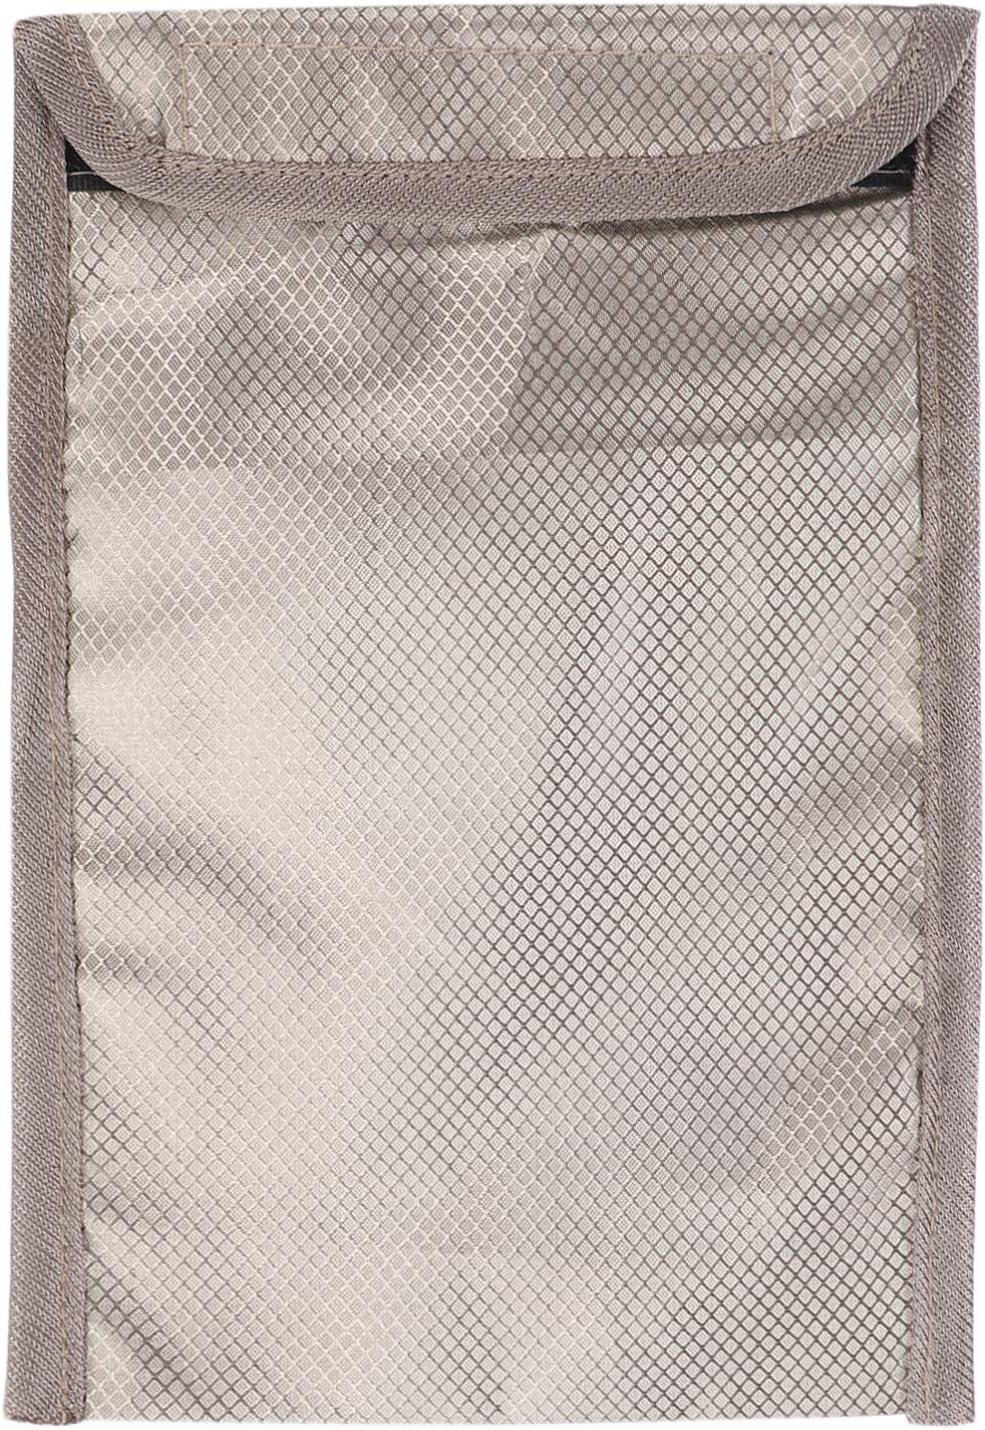 VILLCASE Anti- Radiation Cell High quality Phone Cellphone Genuine Sleeve- Block 2pcs